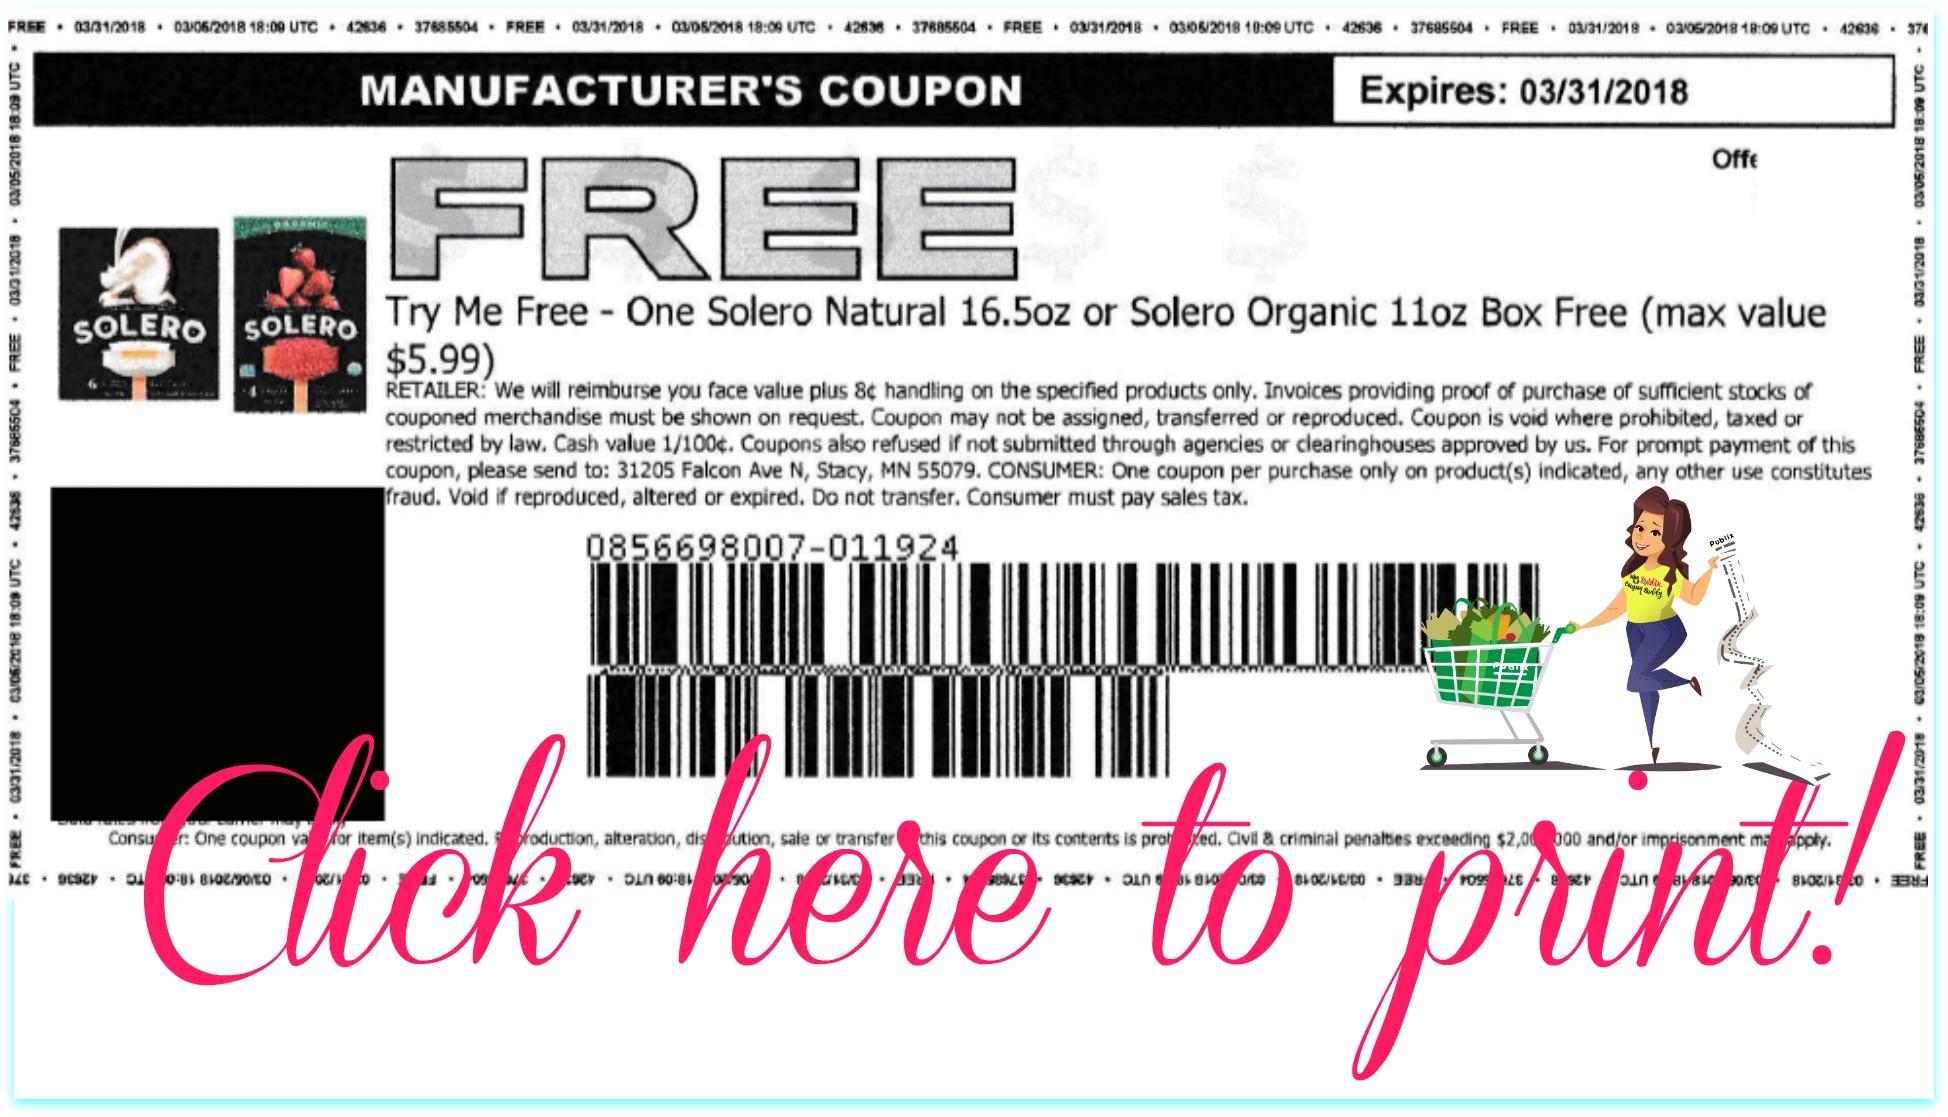 FREE Solero Fruit Bars Coupon